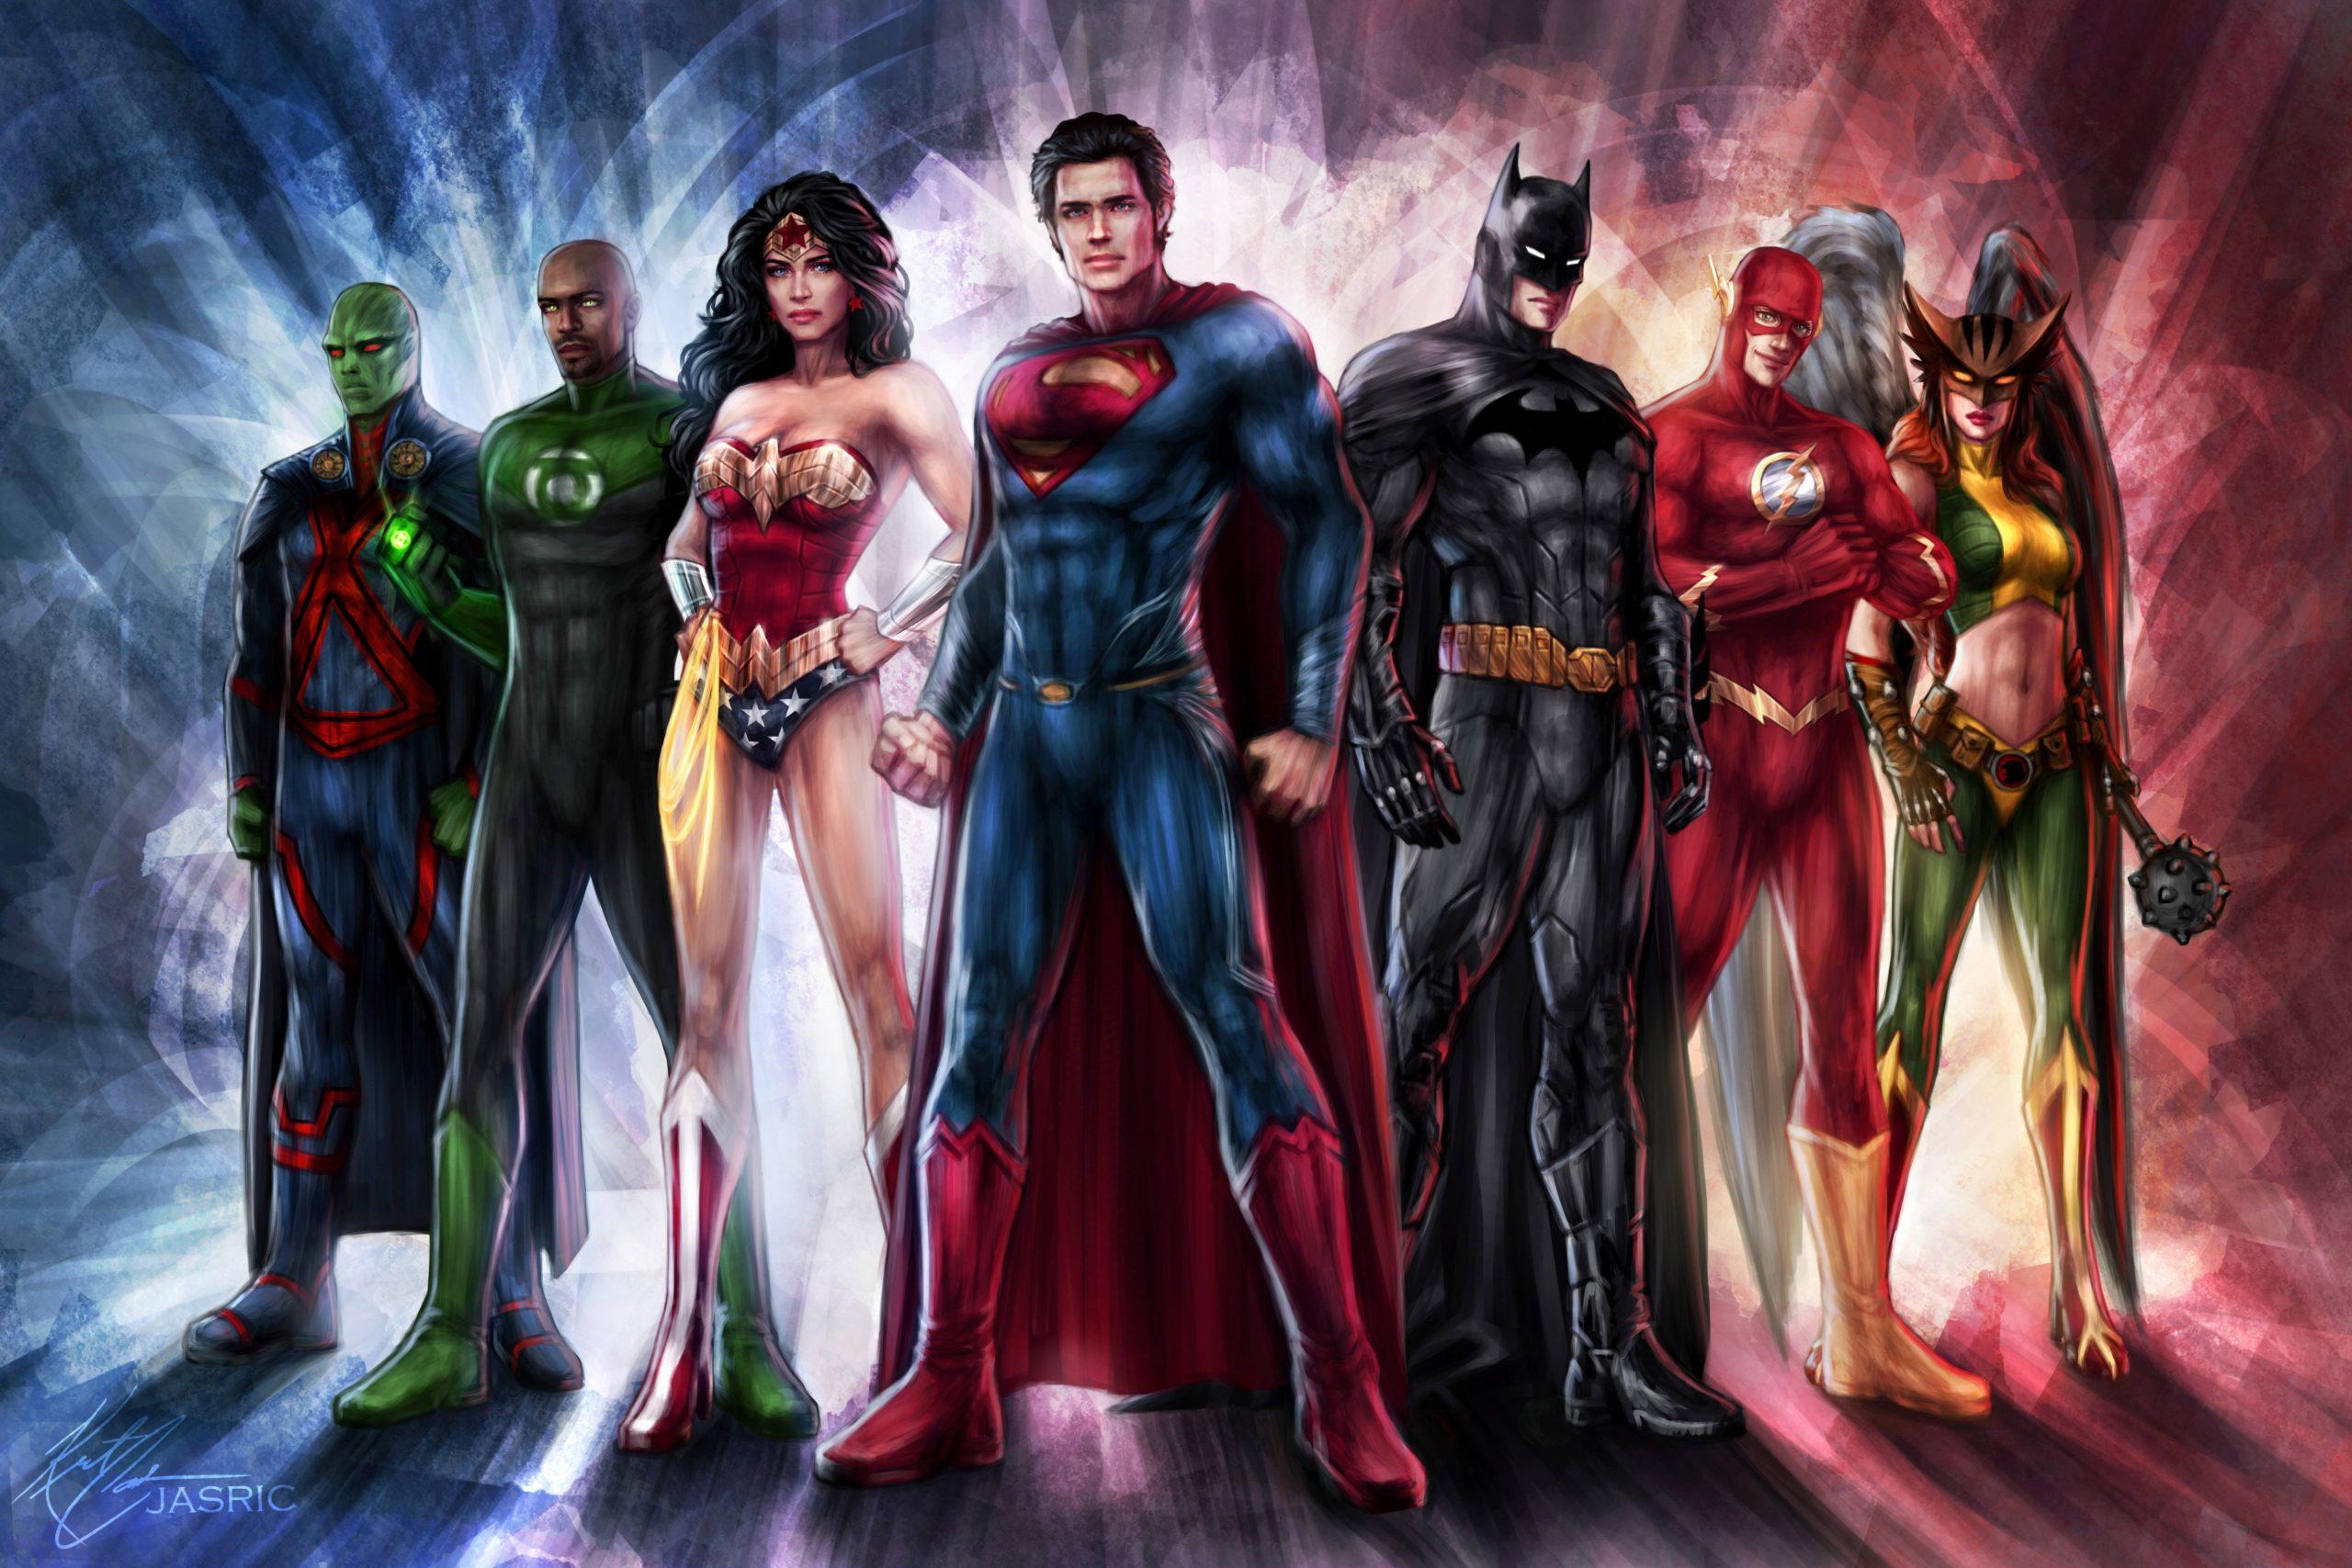 justice league wallpaper 4k